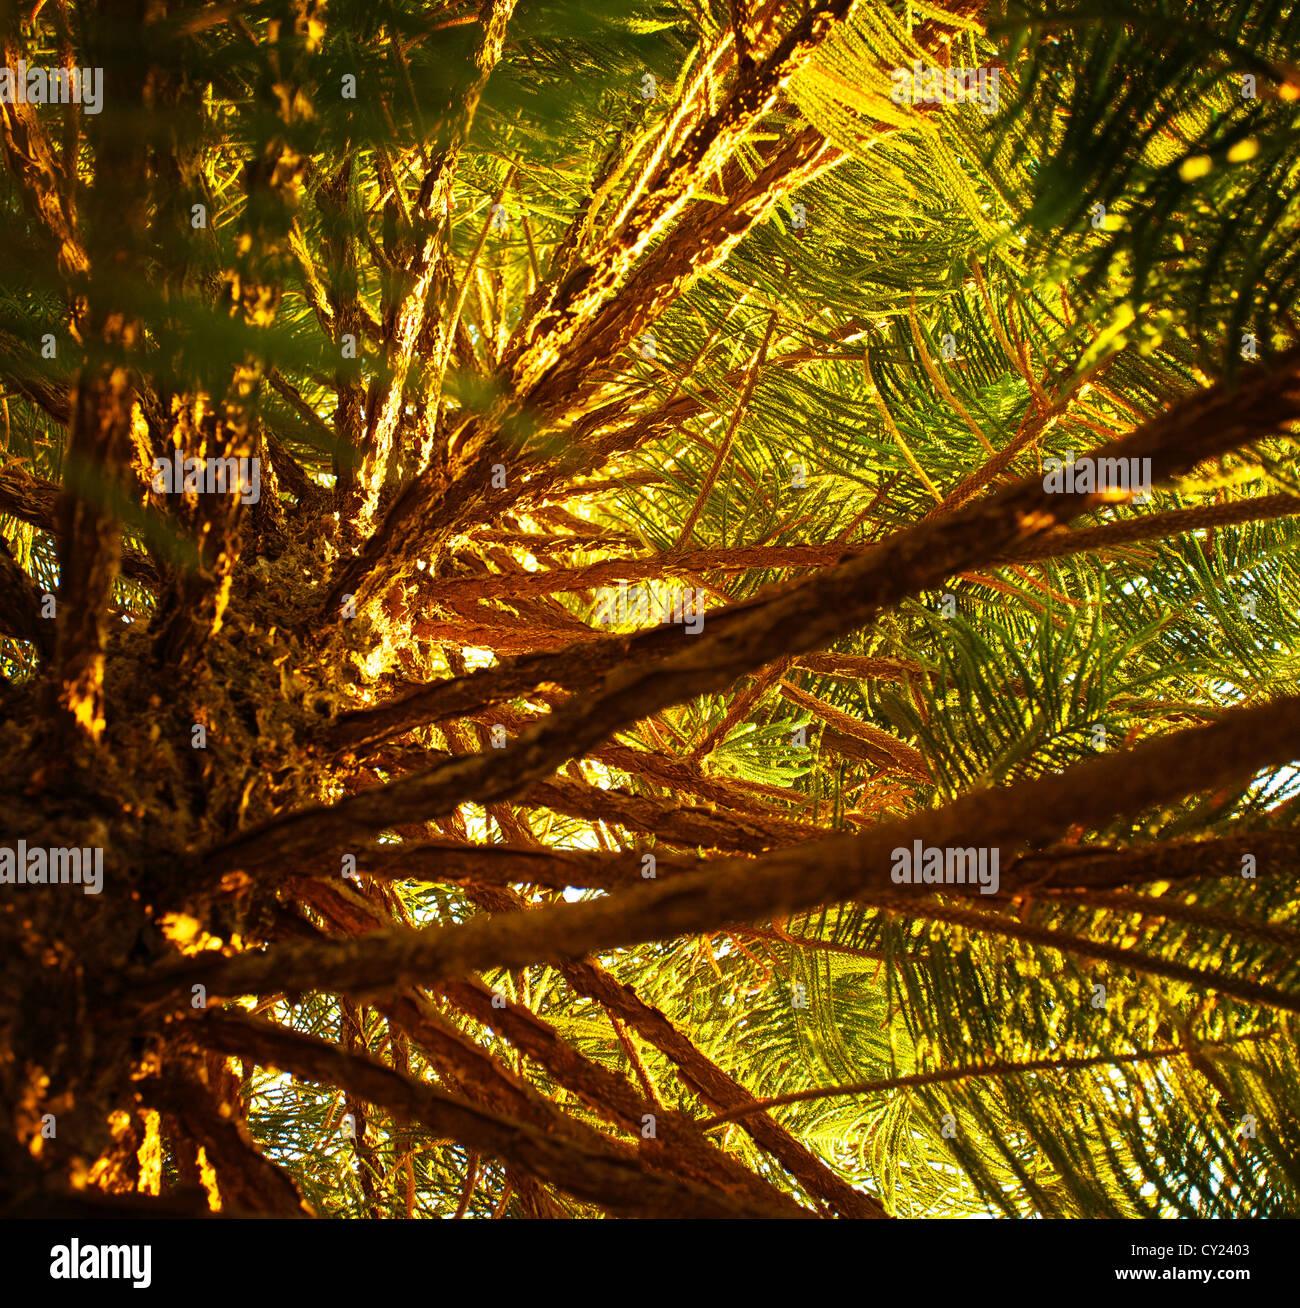 evergreen forest stockfotos evergreen forest bilder alamy. Black Bedroom Furniture Sets. Home Design Ideas